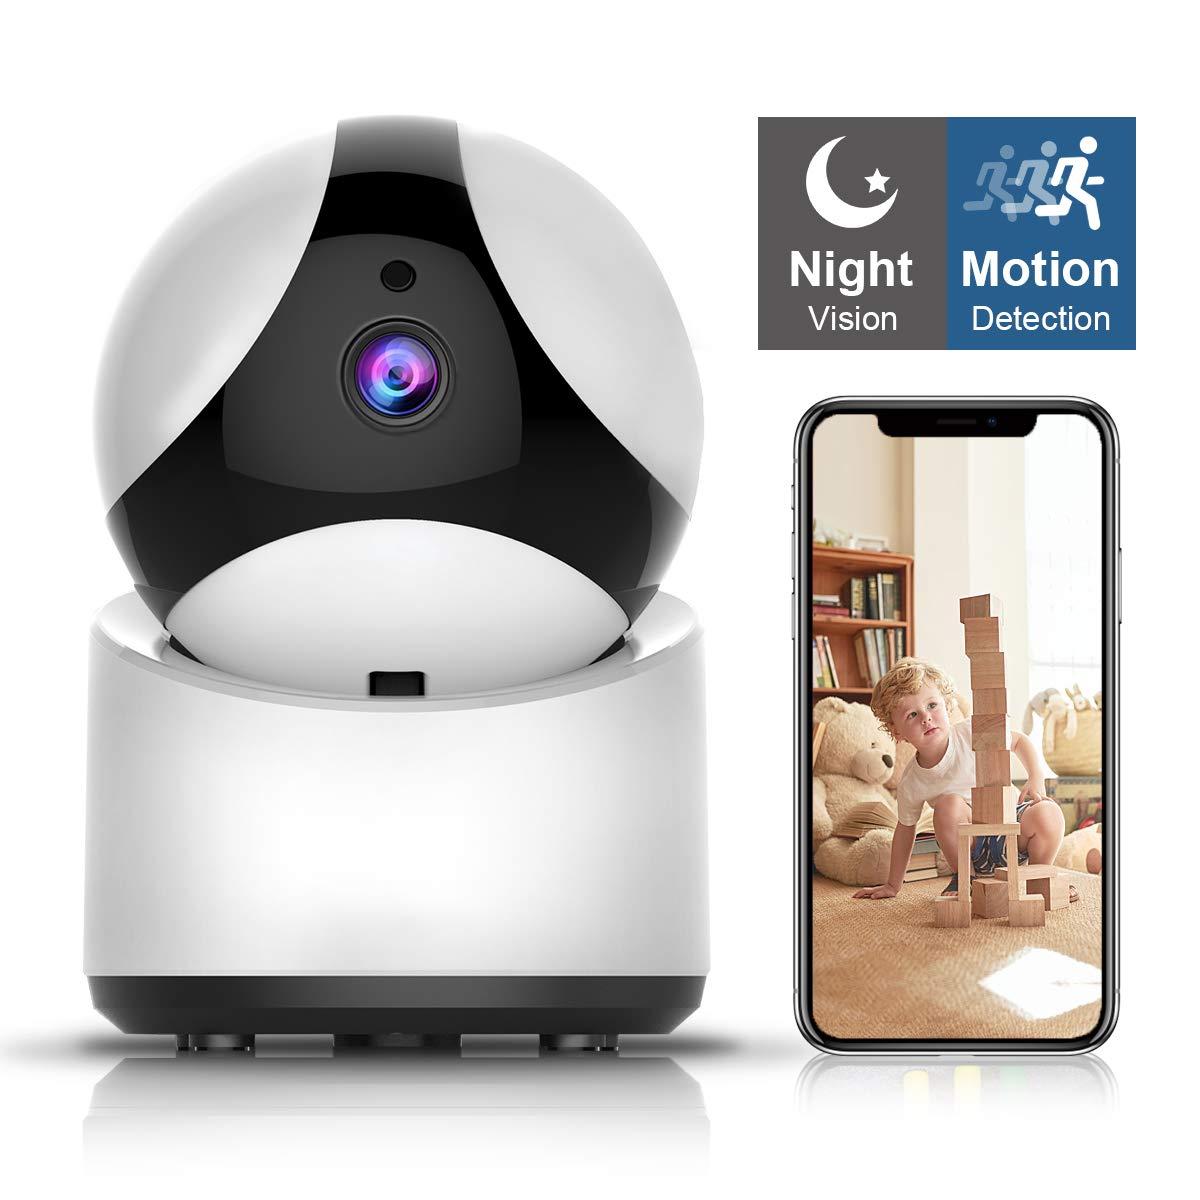 FandiiShop Wireless Security Camera, IP Camera WiFi Home Indoor Camera for Baby/Pet/Nanny, Motion Detection, 2 Way Audio Night Vision, Remote Monitoring by FandiiShop